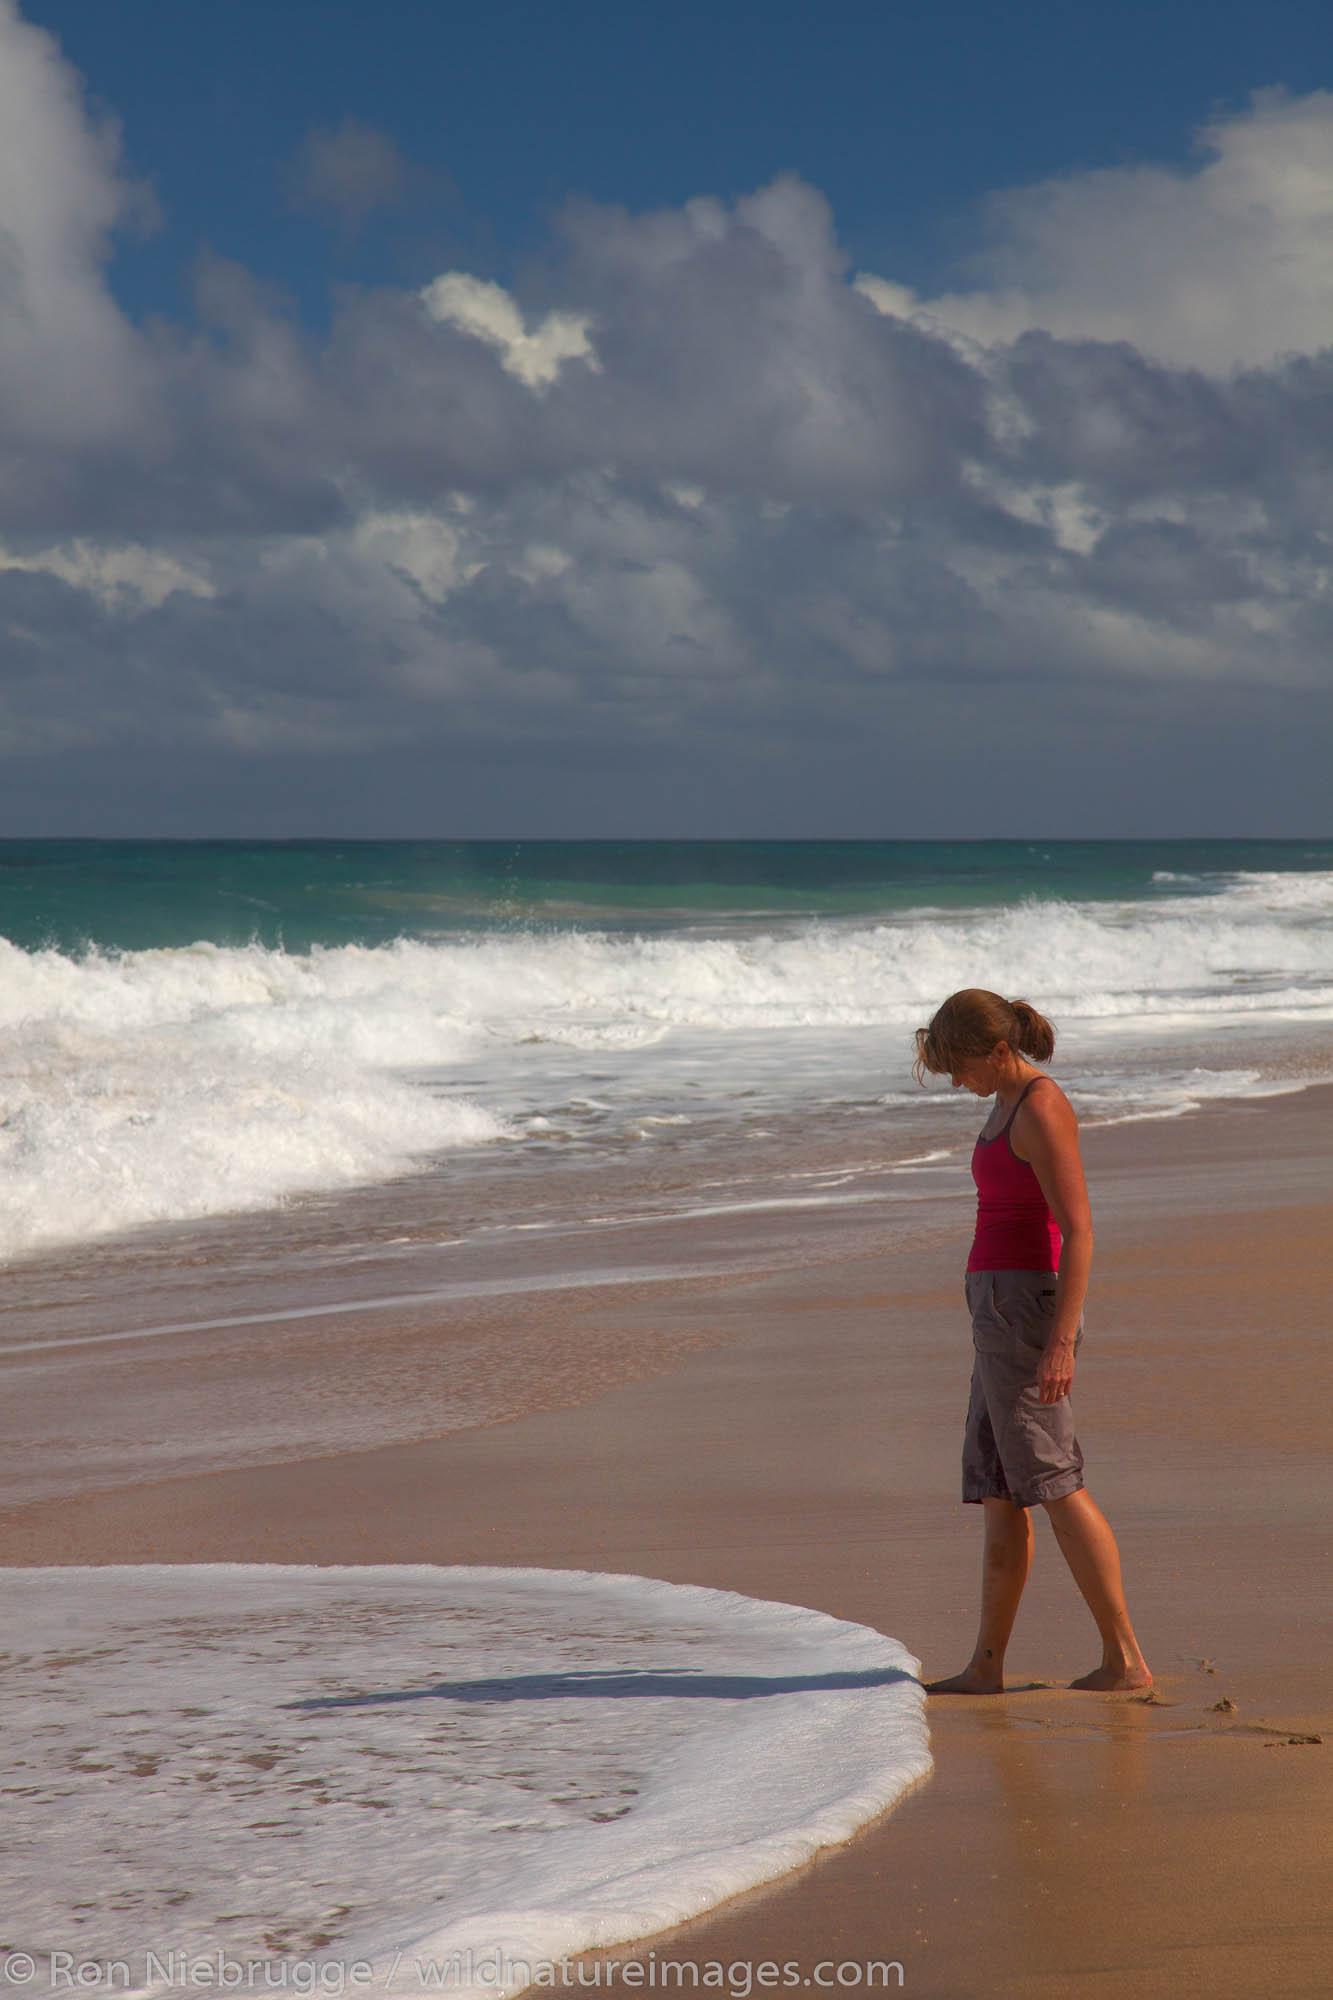 Hiker at Hanakapi'ai Beach along the Kalalau Trail, Na Pali Coast, Kauai, Hawaii.  (Model Released)